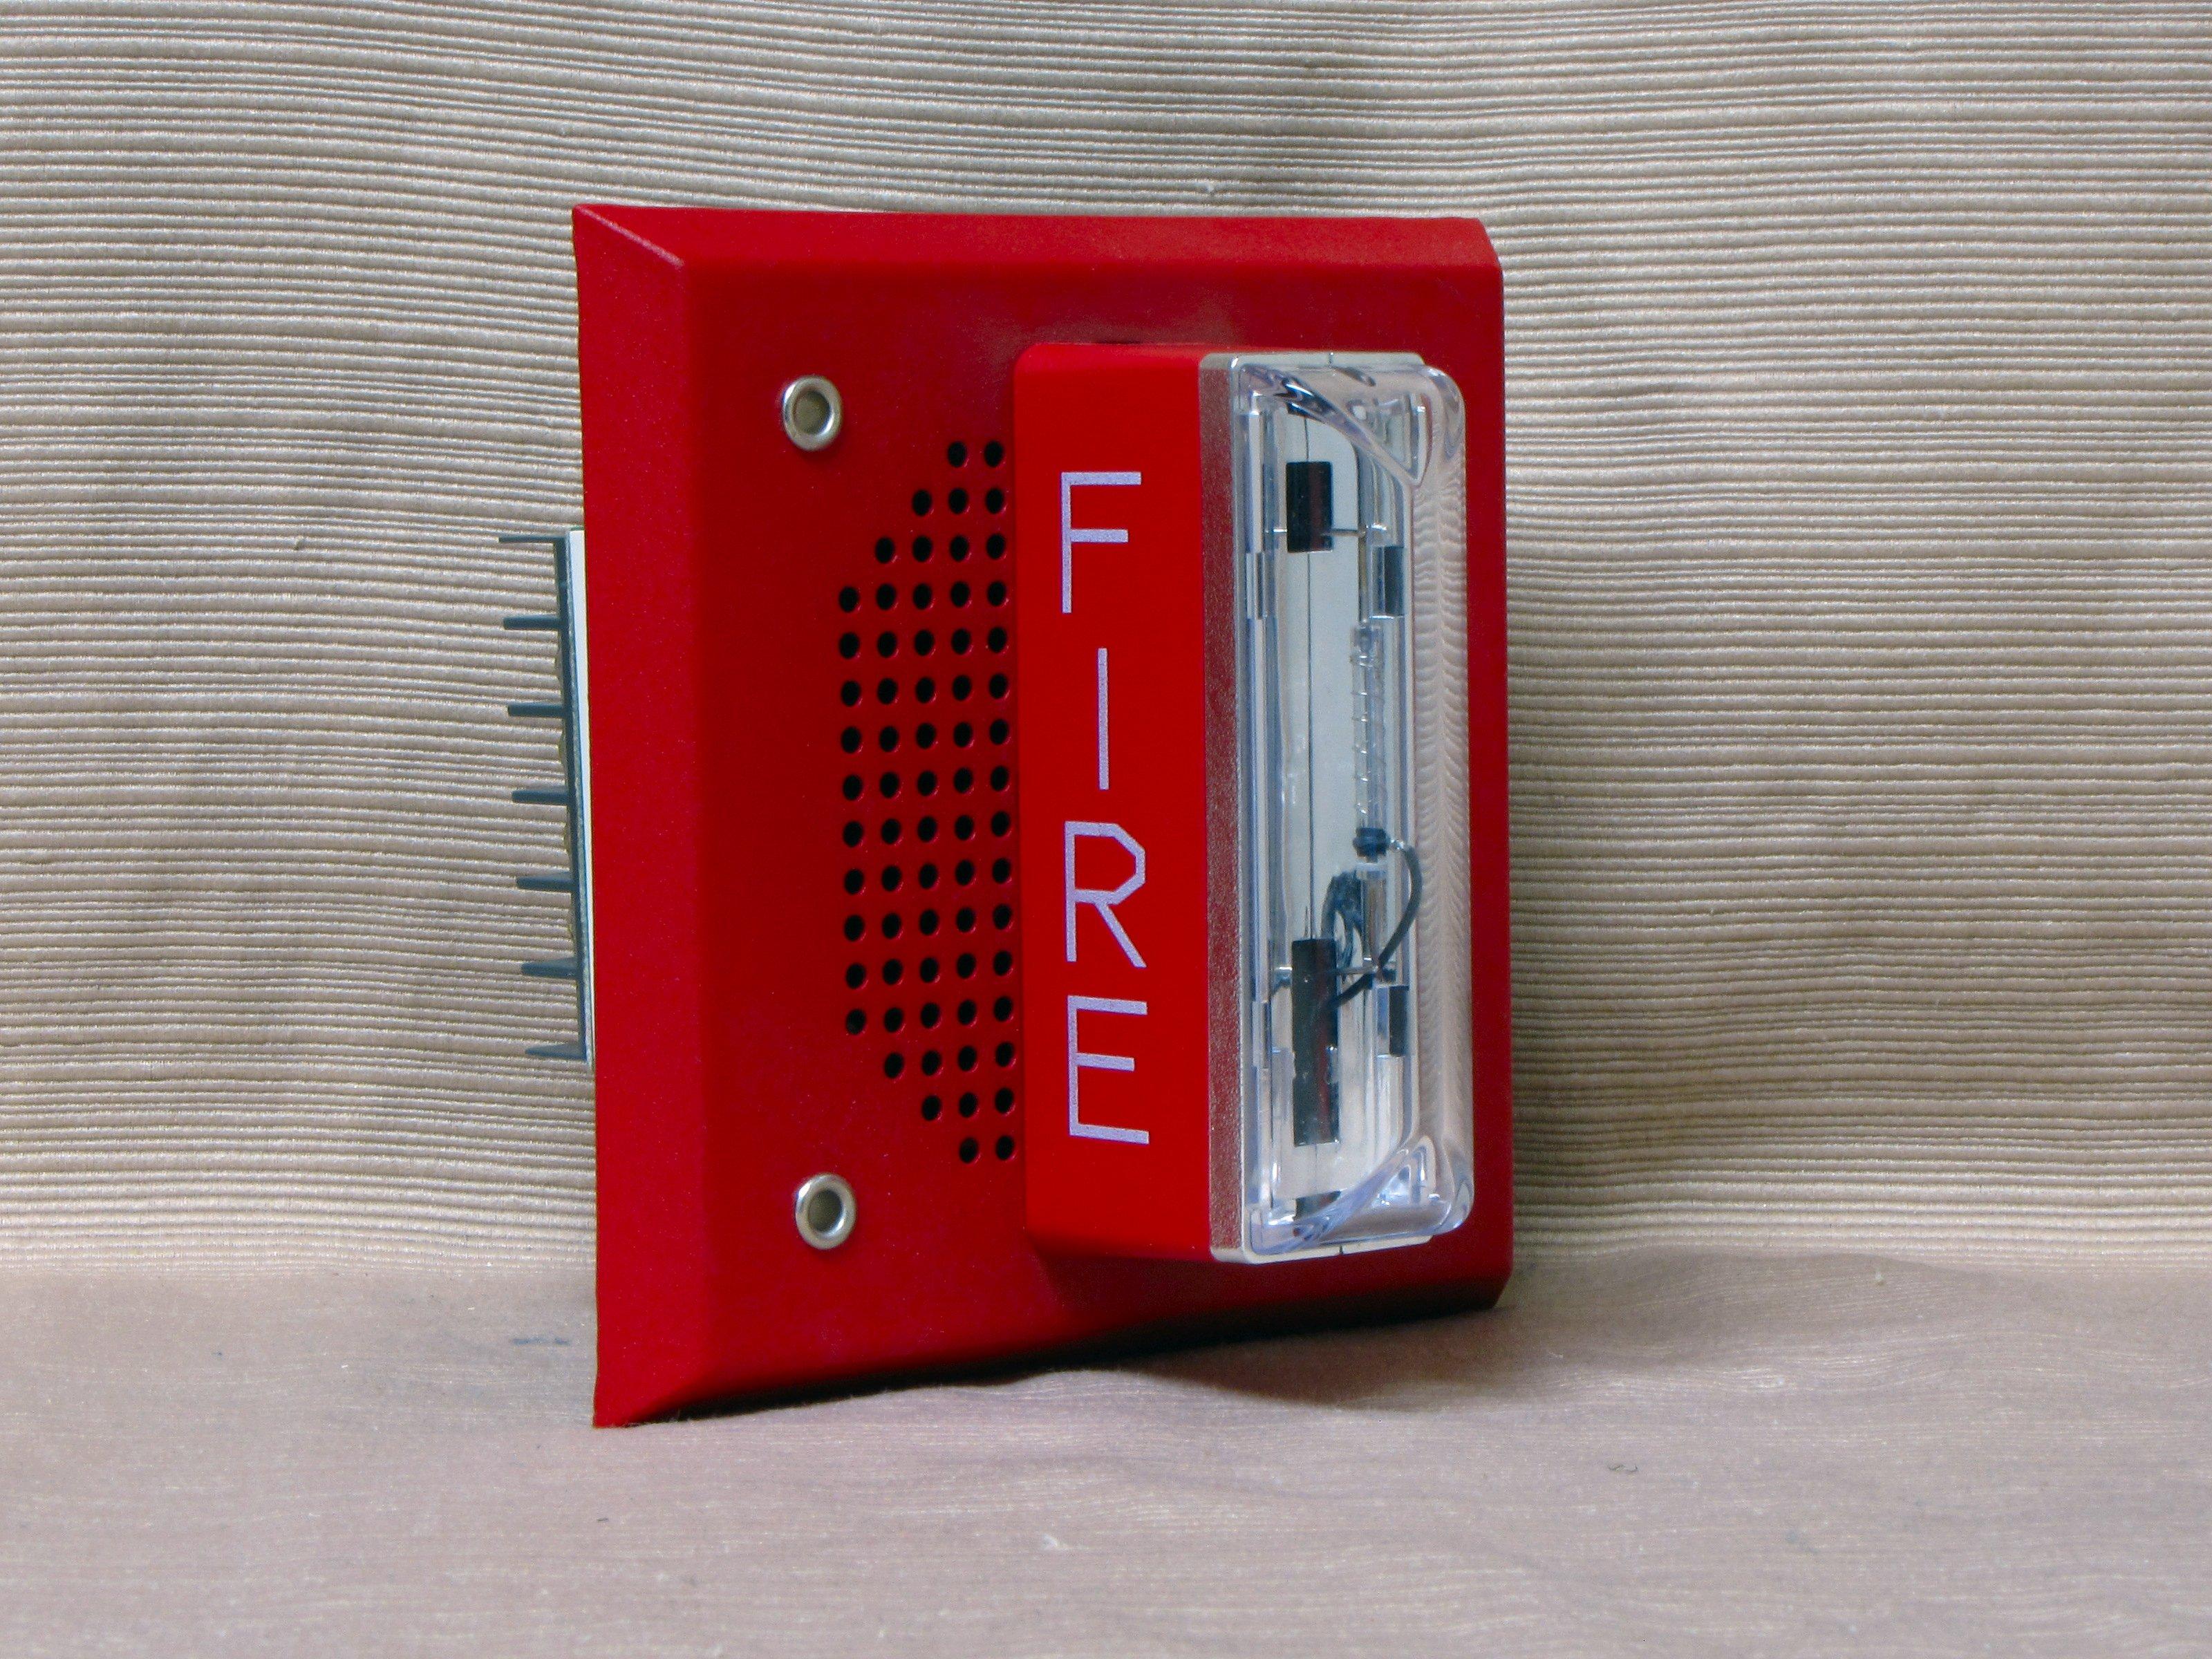 the schumin web gentex spk4 15 75wr rh schuminweb com SpectrAlert Horn Strobe Gentex Smoke Detector with Strobe